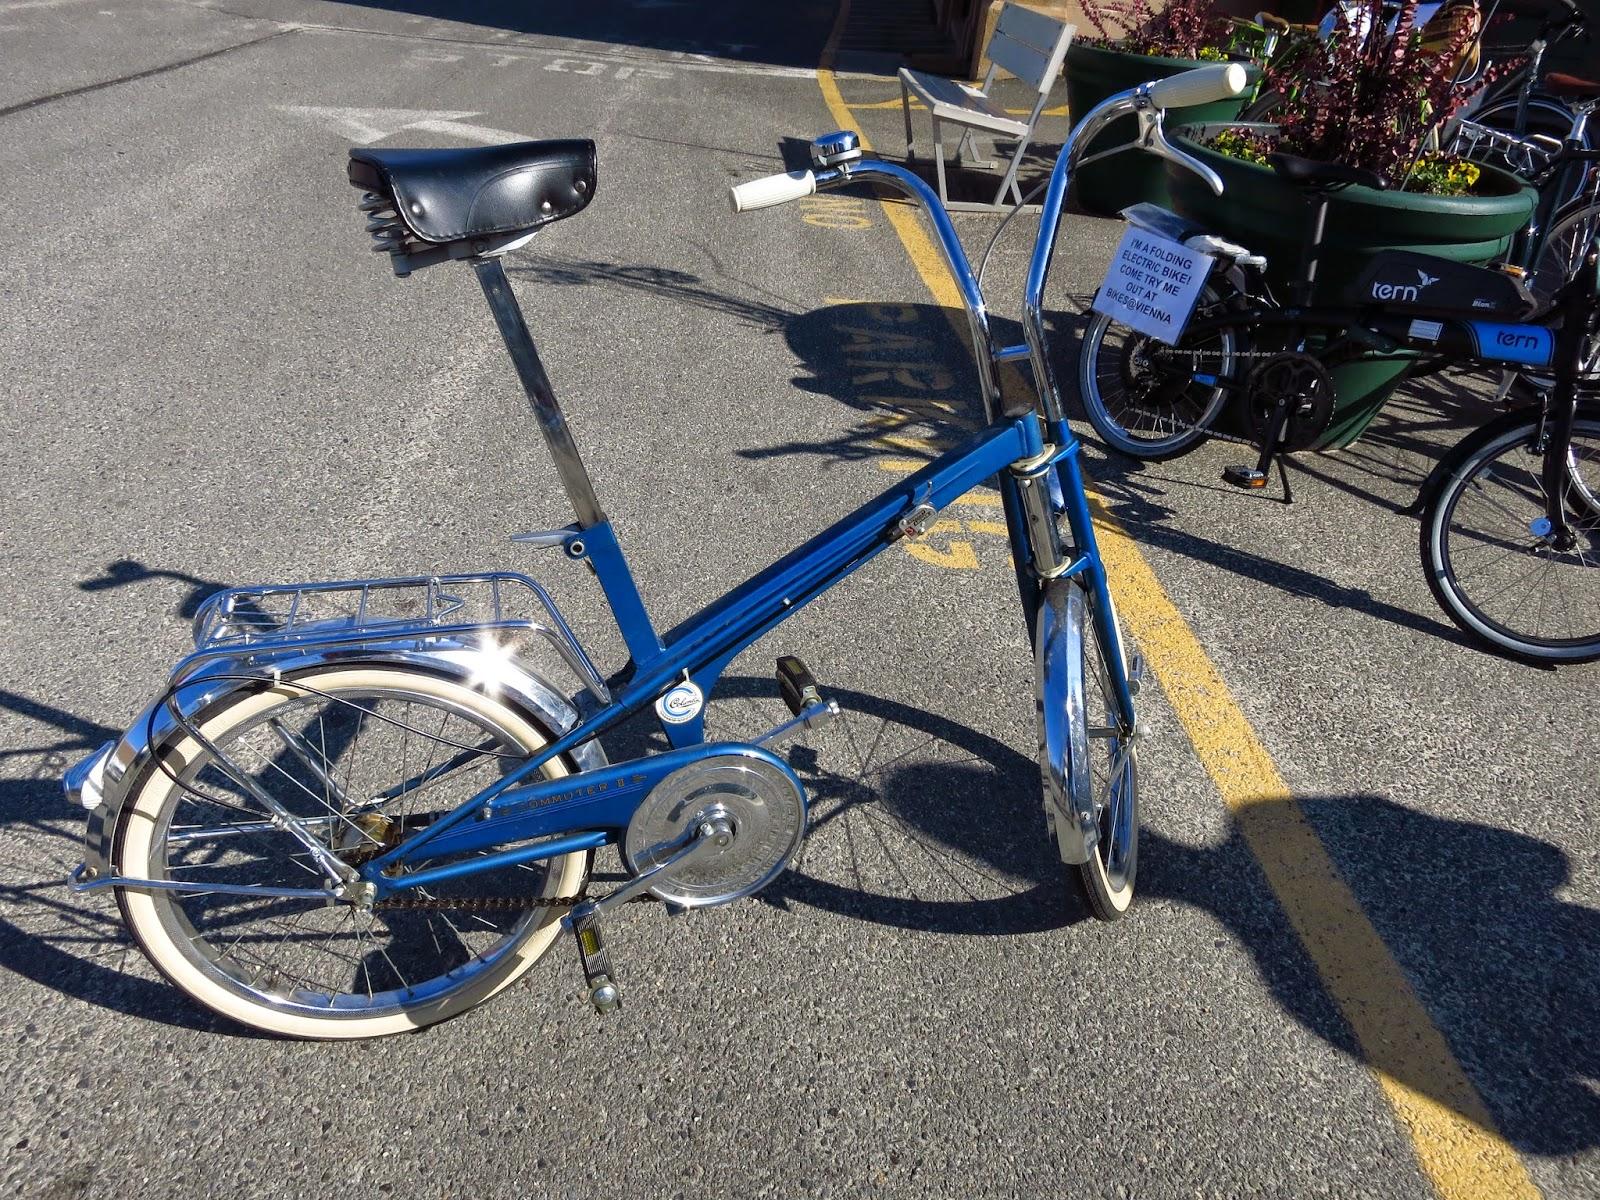 Bikes Vienna Recumbent Bike Interesting folding bike